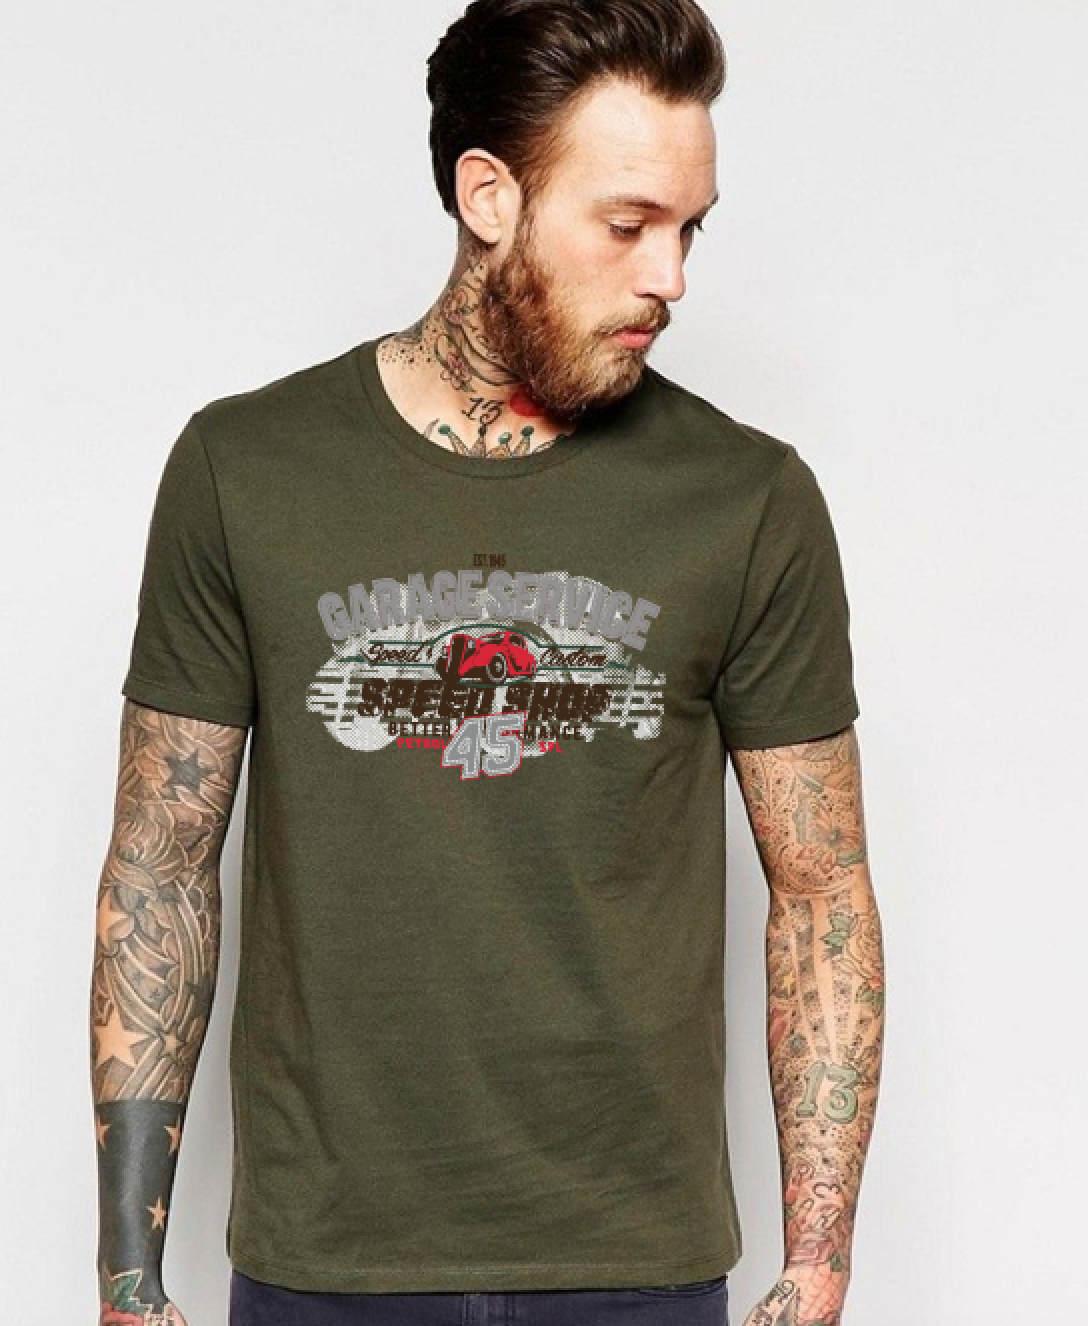 Mechanic Tshirts Auto Mechanic Shirts Personalized Gift Custom Etsy